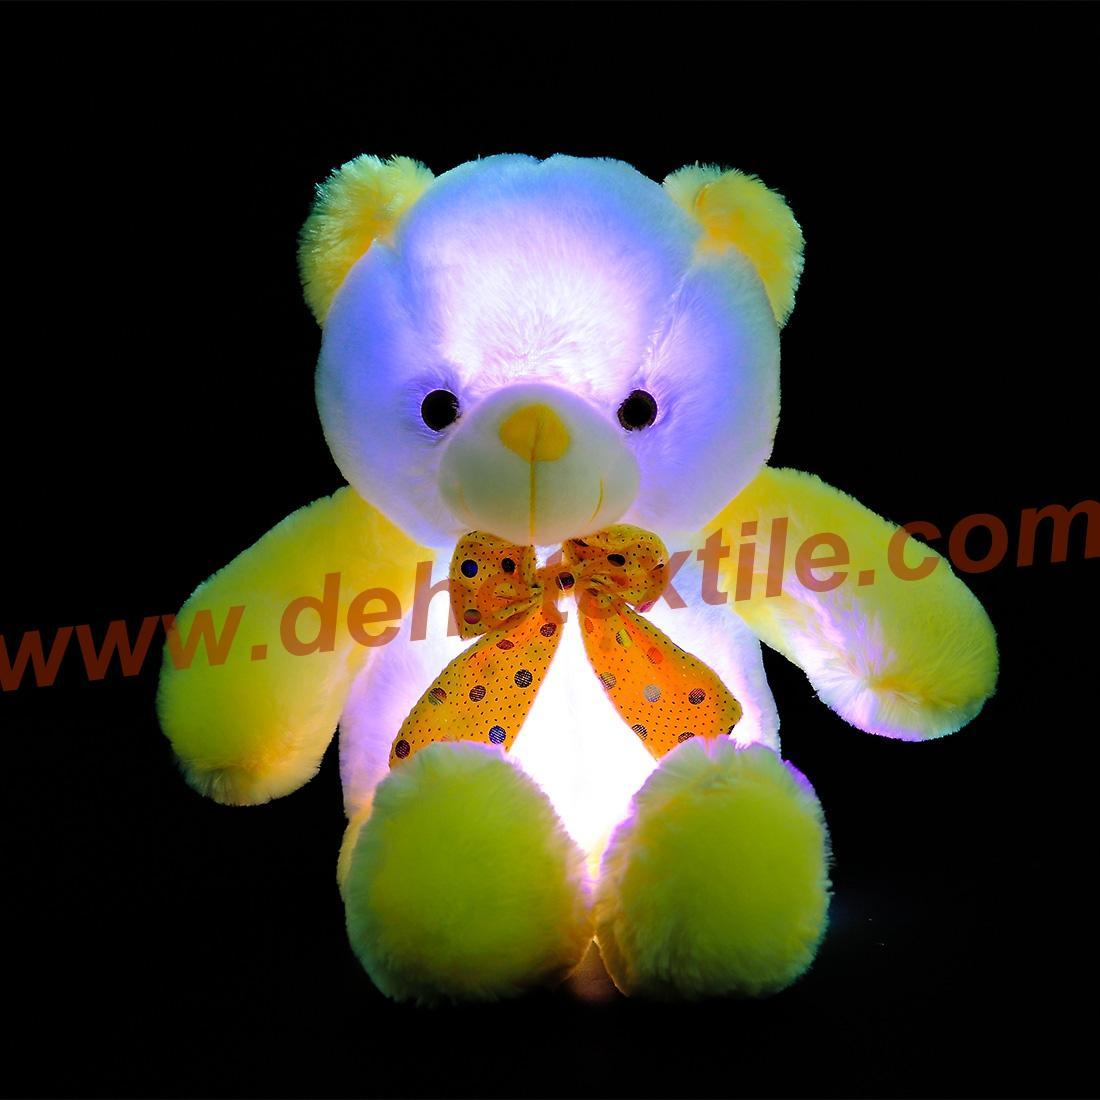 New Style LED Inductive Teddy Bear Stuffed Animals Plush Toy  6